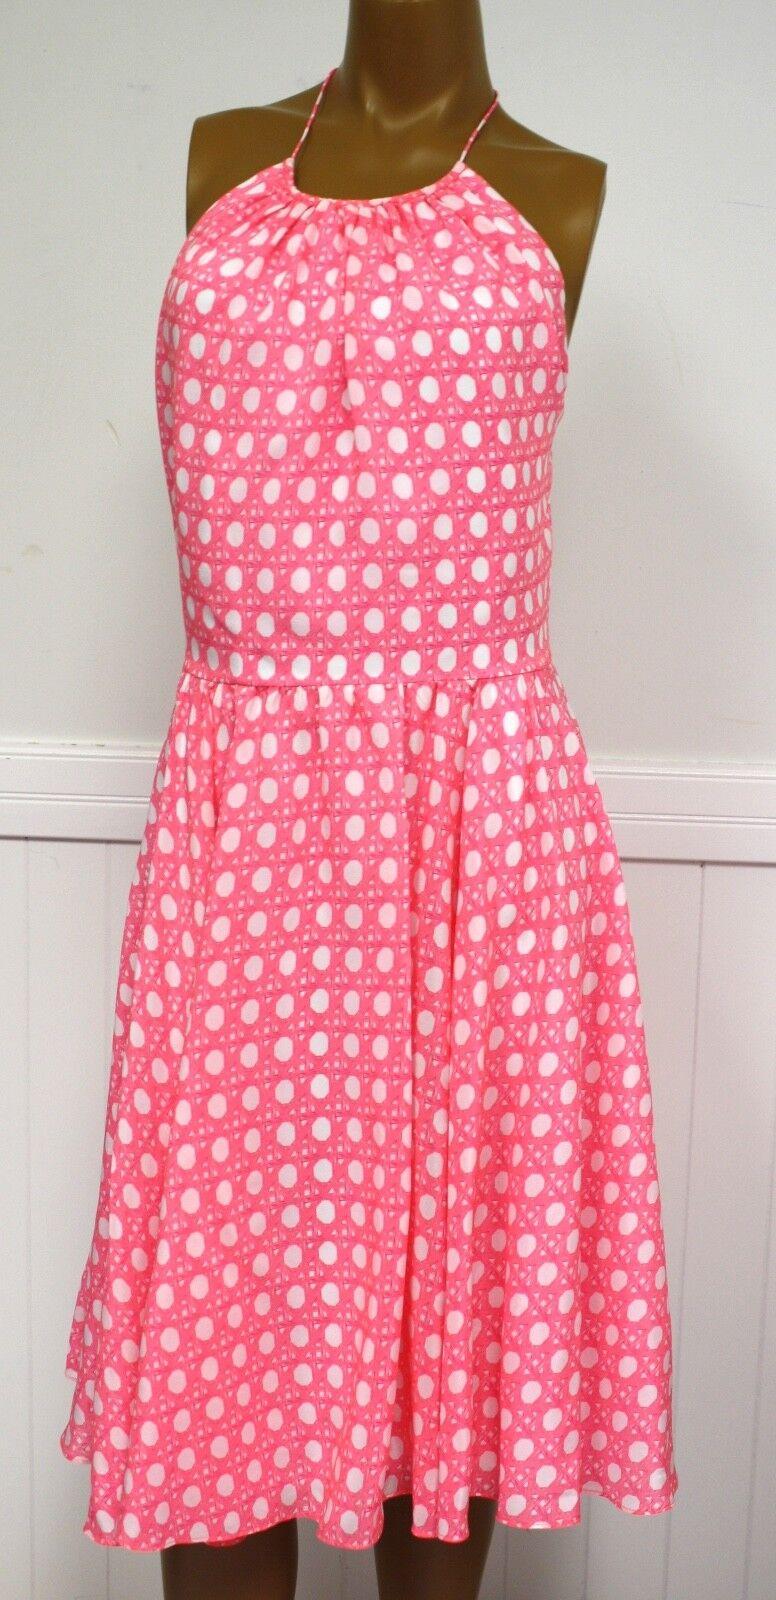 Vineyard Vines Dress Pink Coral Sand Caning Print Halter Dress MSRP 228 NEW